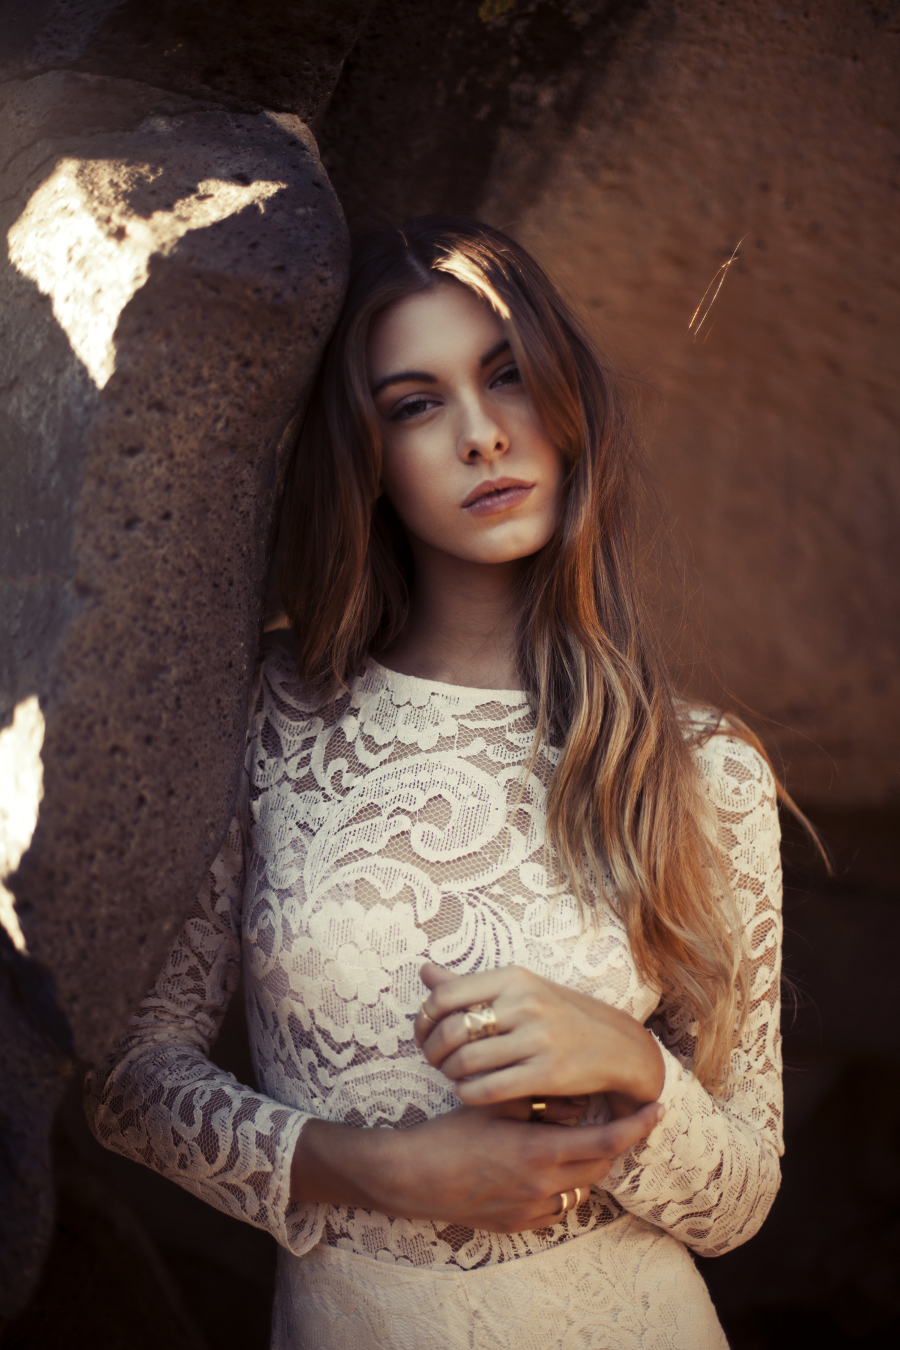 Gypsum Spring 2015 Quot Desert Rose Quot Carmella Rose By Derren Verzosa Mith Magazine